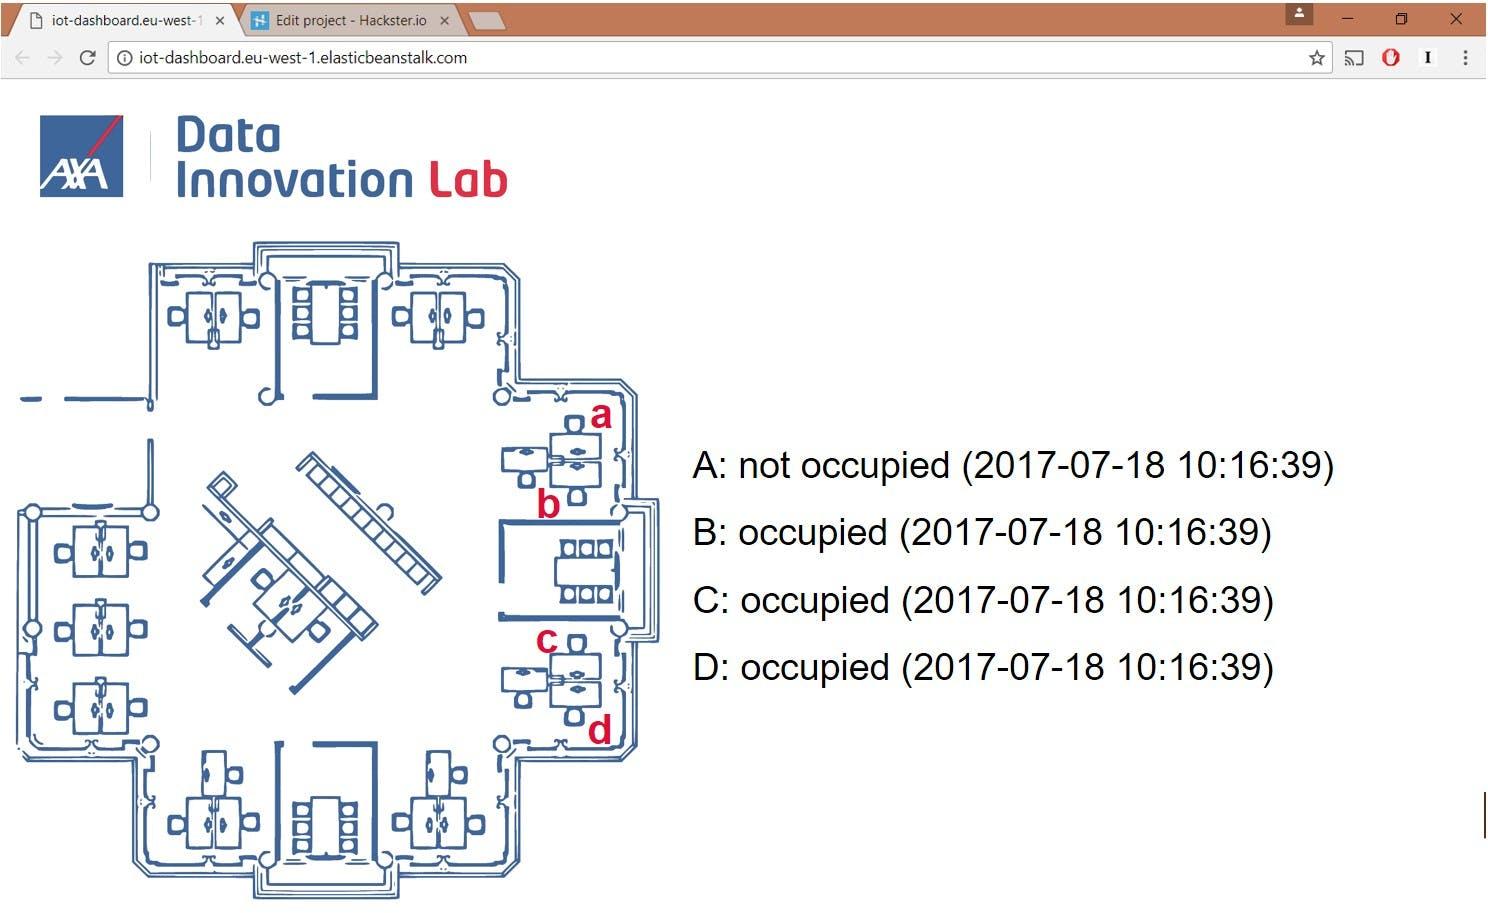 Web Application Indicating Current Desk Occupation